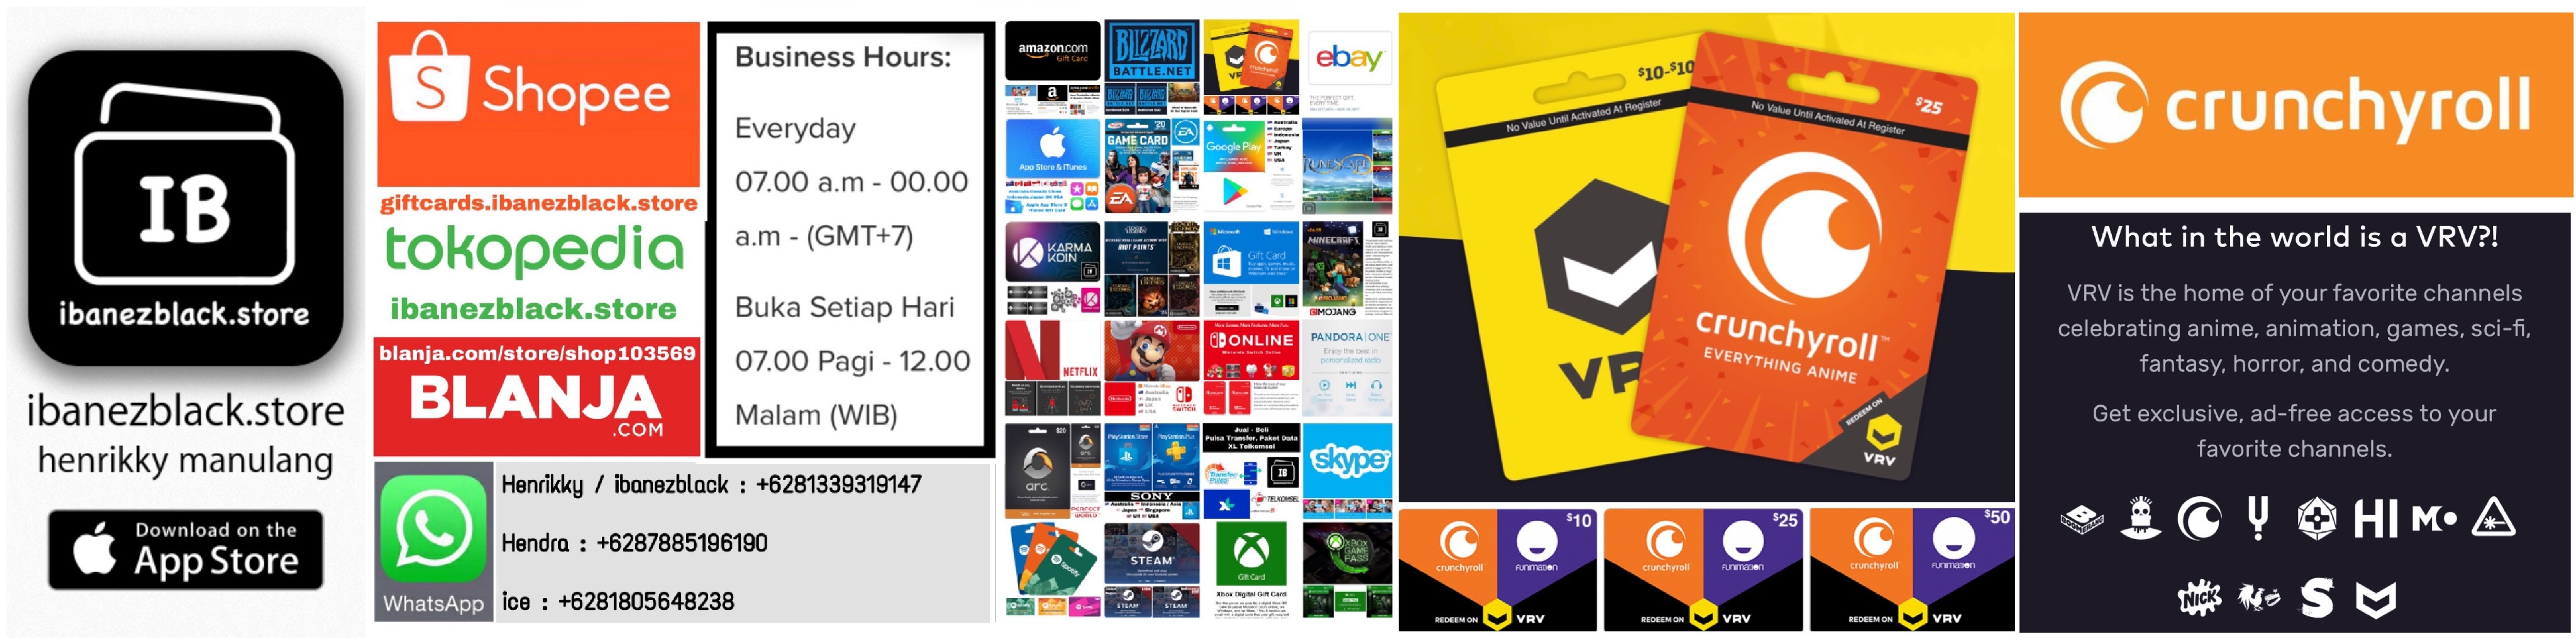 Tersedia Jual Beli Crunchyroll on VRV $10, $25, $50 region US di ibanezblack.store.